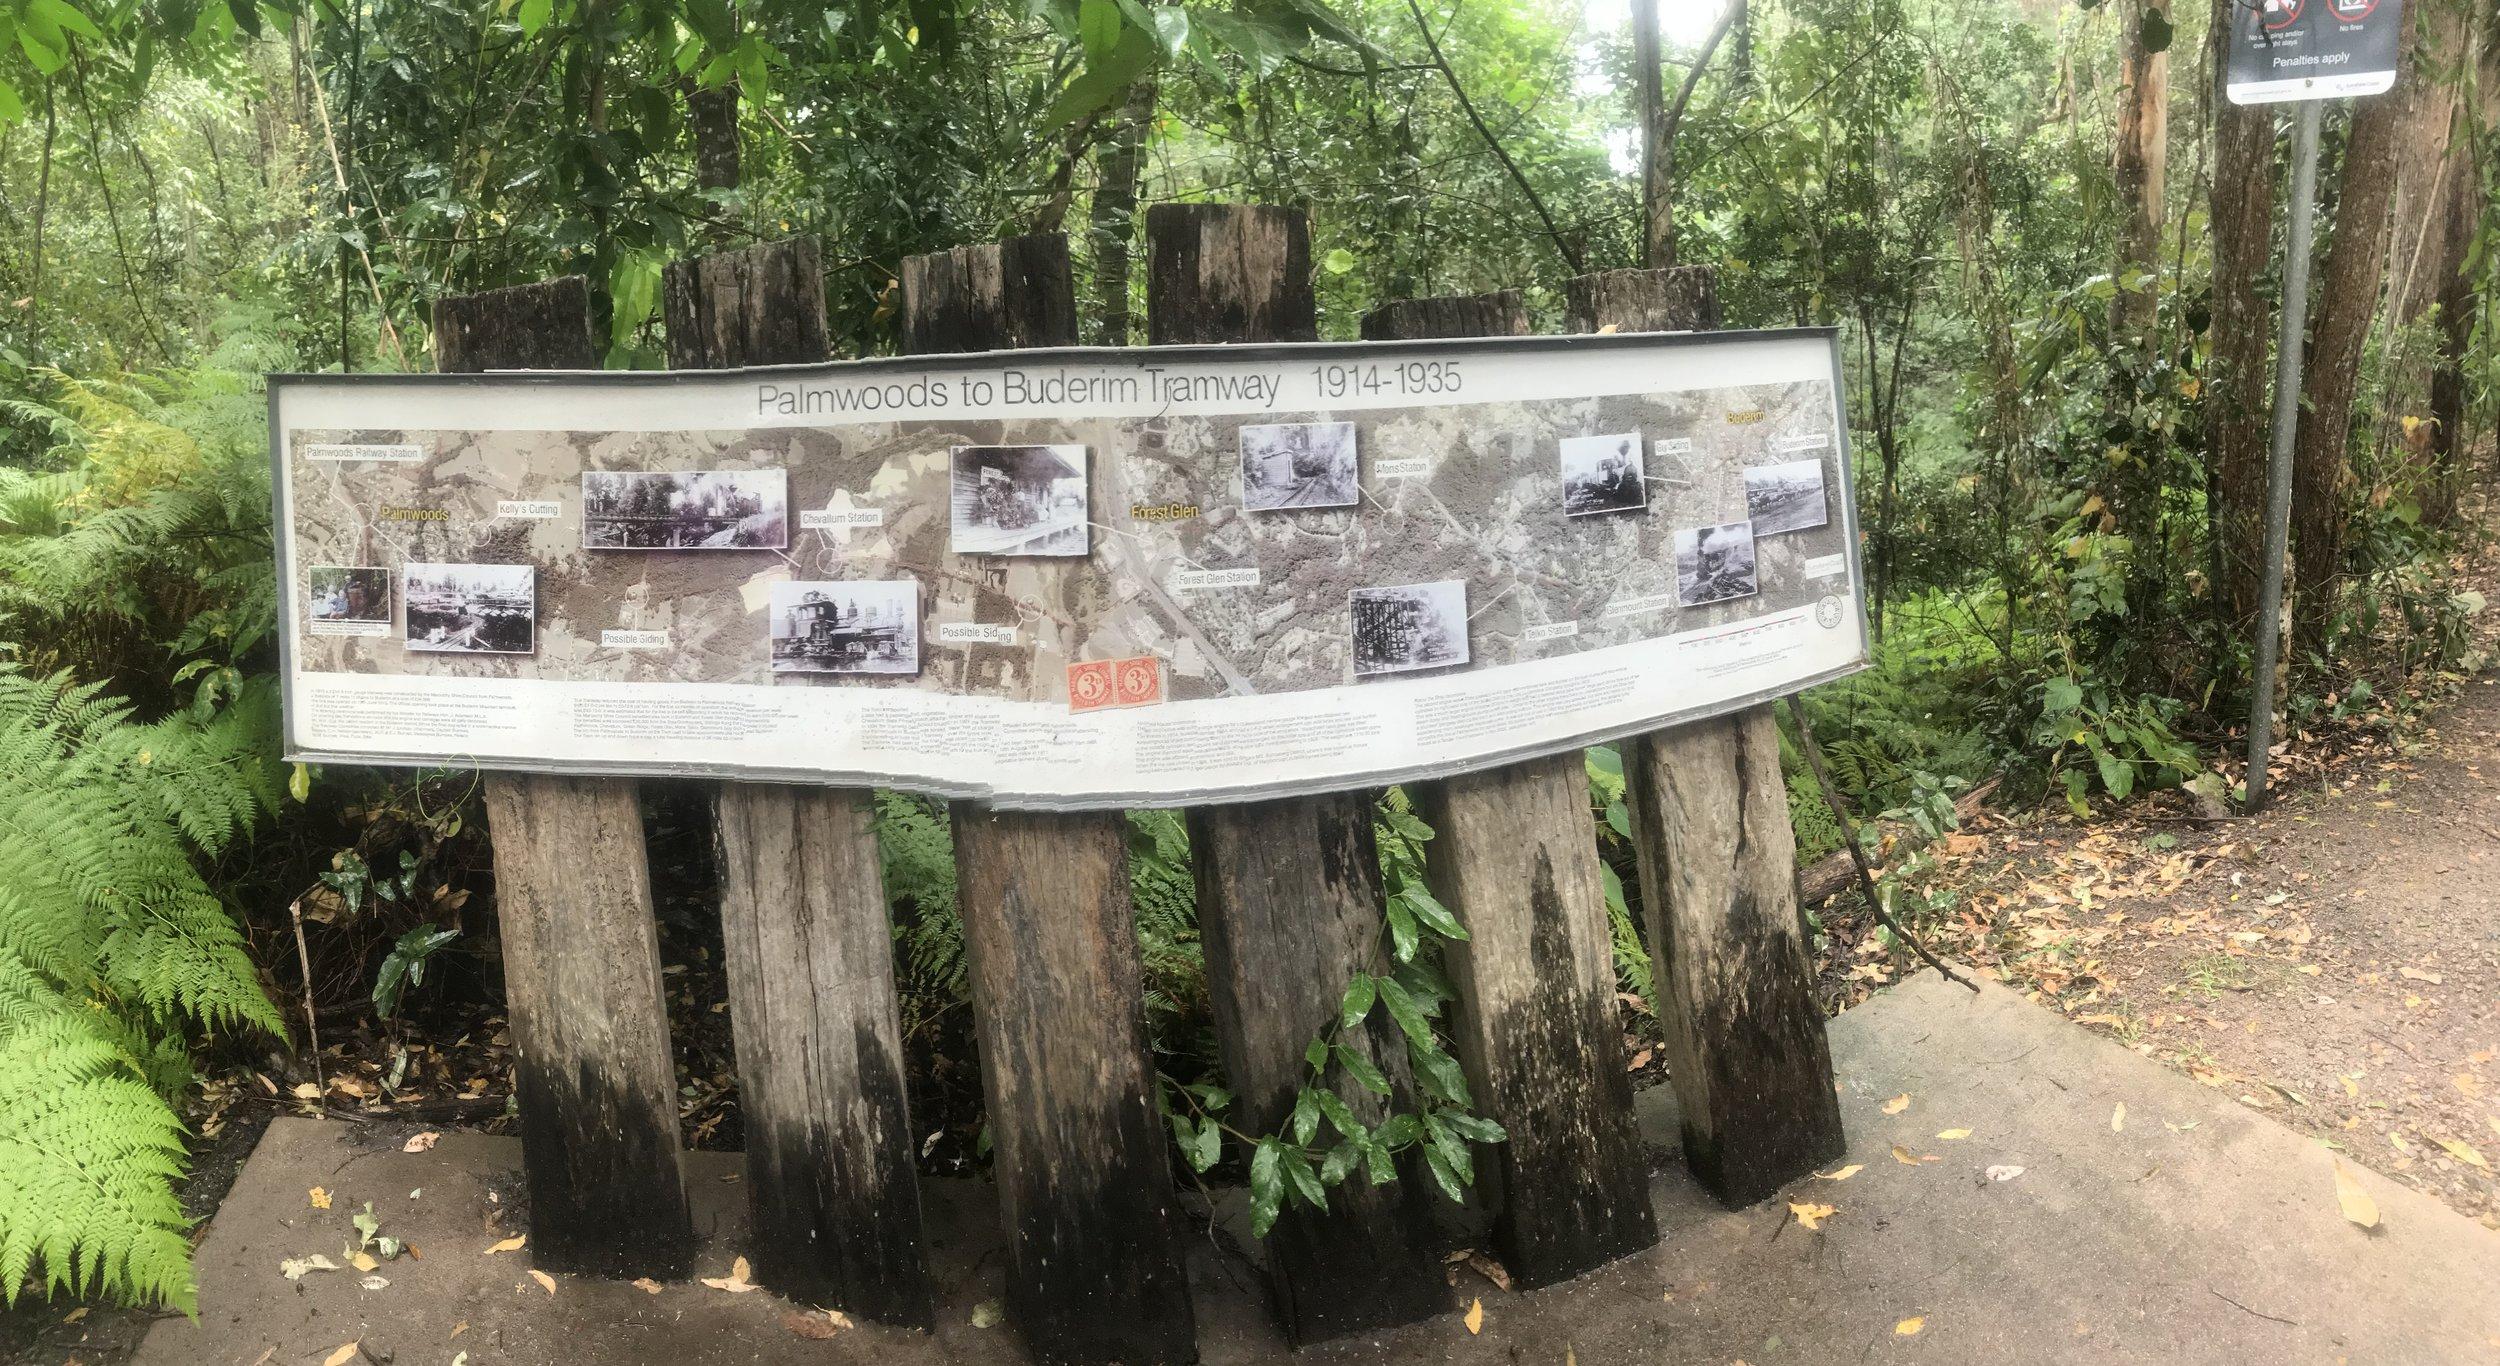 Historical Photos of the railway